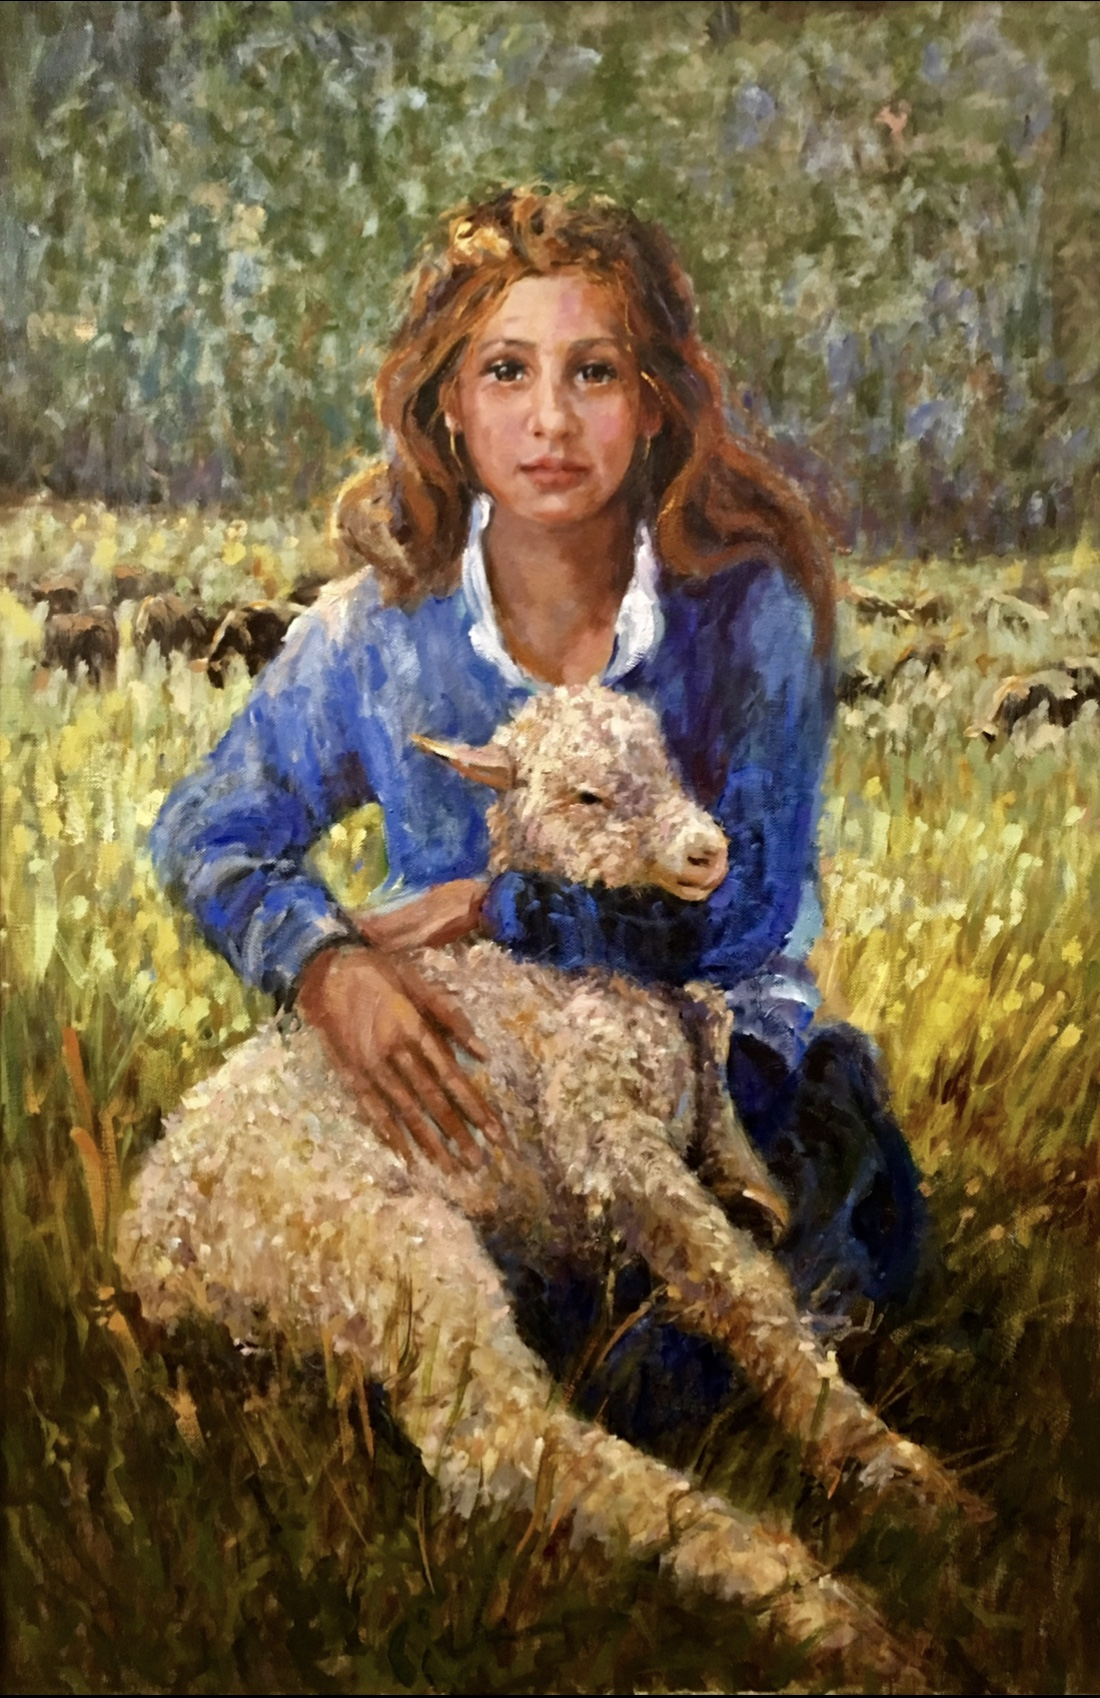 Little Shepherdess of Provence